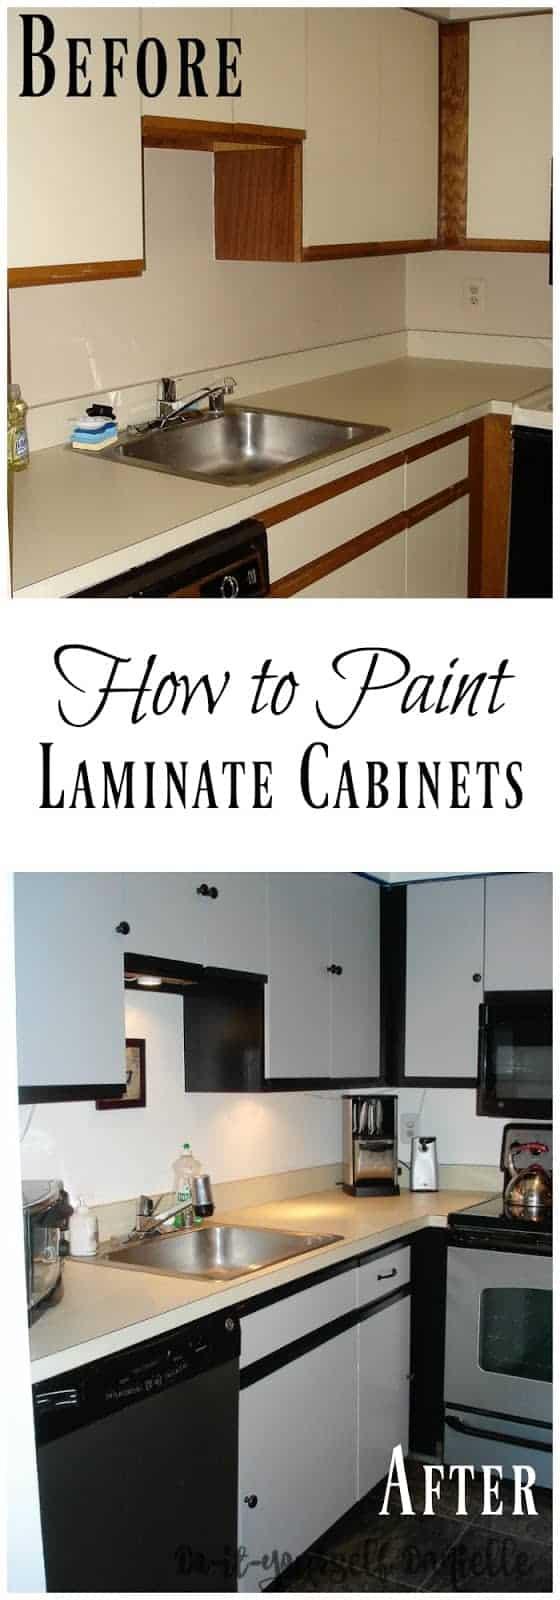 Painting Laminate Cabinets - DIY Danielle